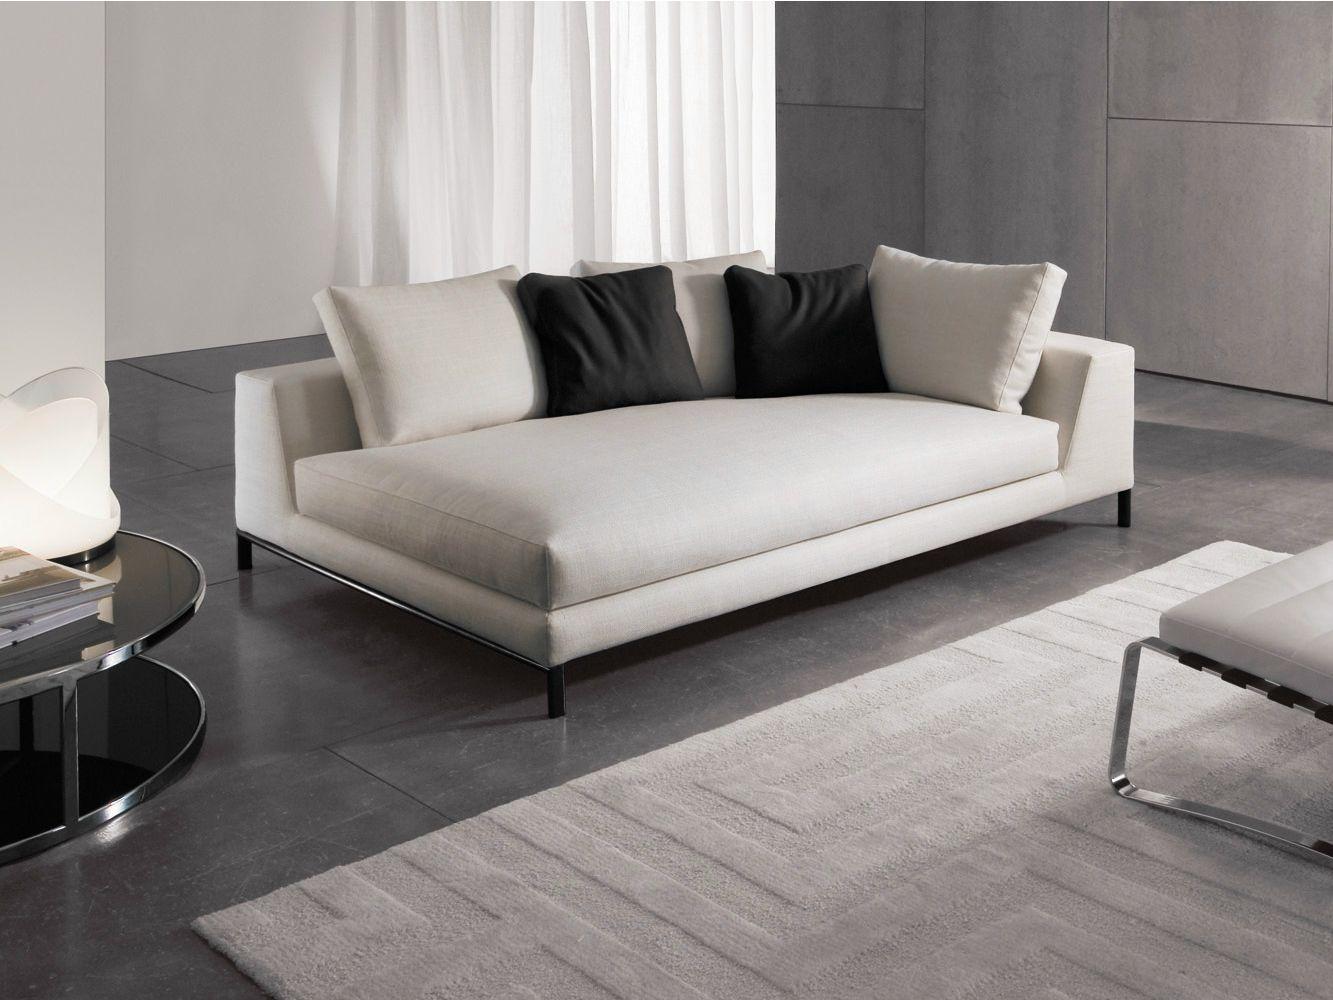 Minotti Sofas Australia Extra Large Fabric Corner Sofa Hamilton Islands Living Room